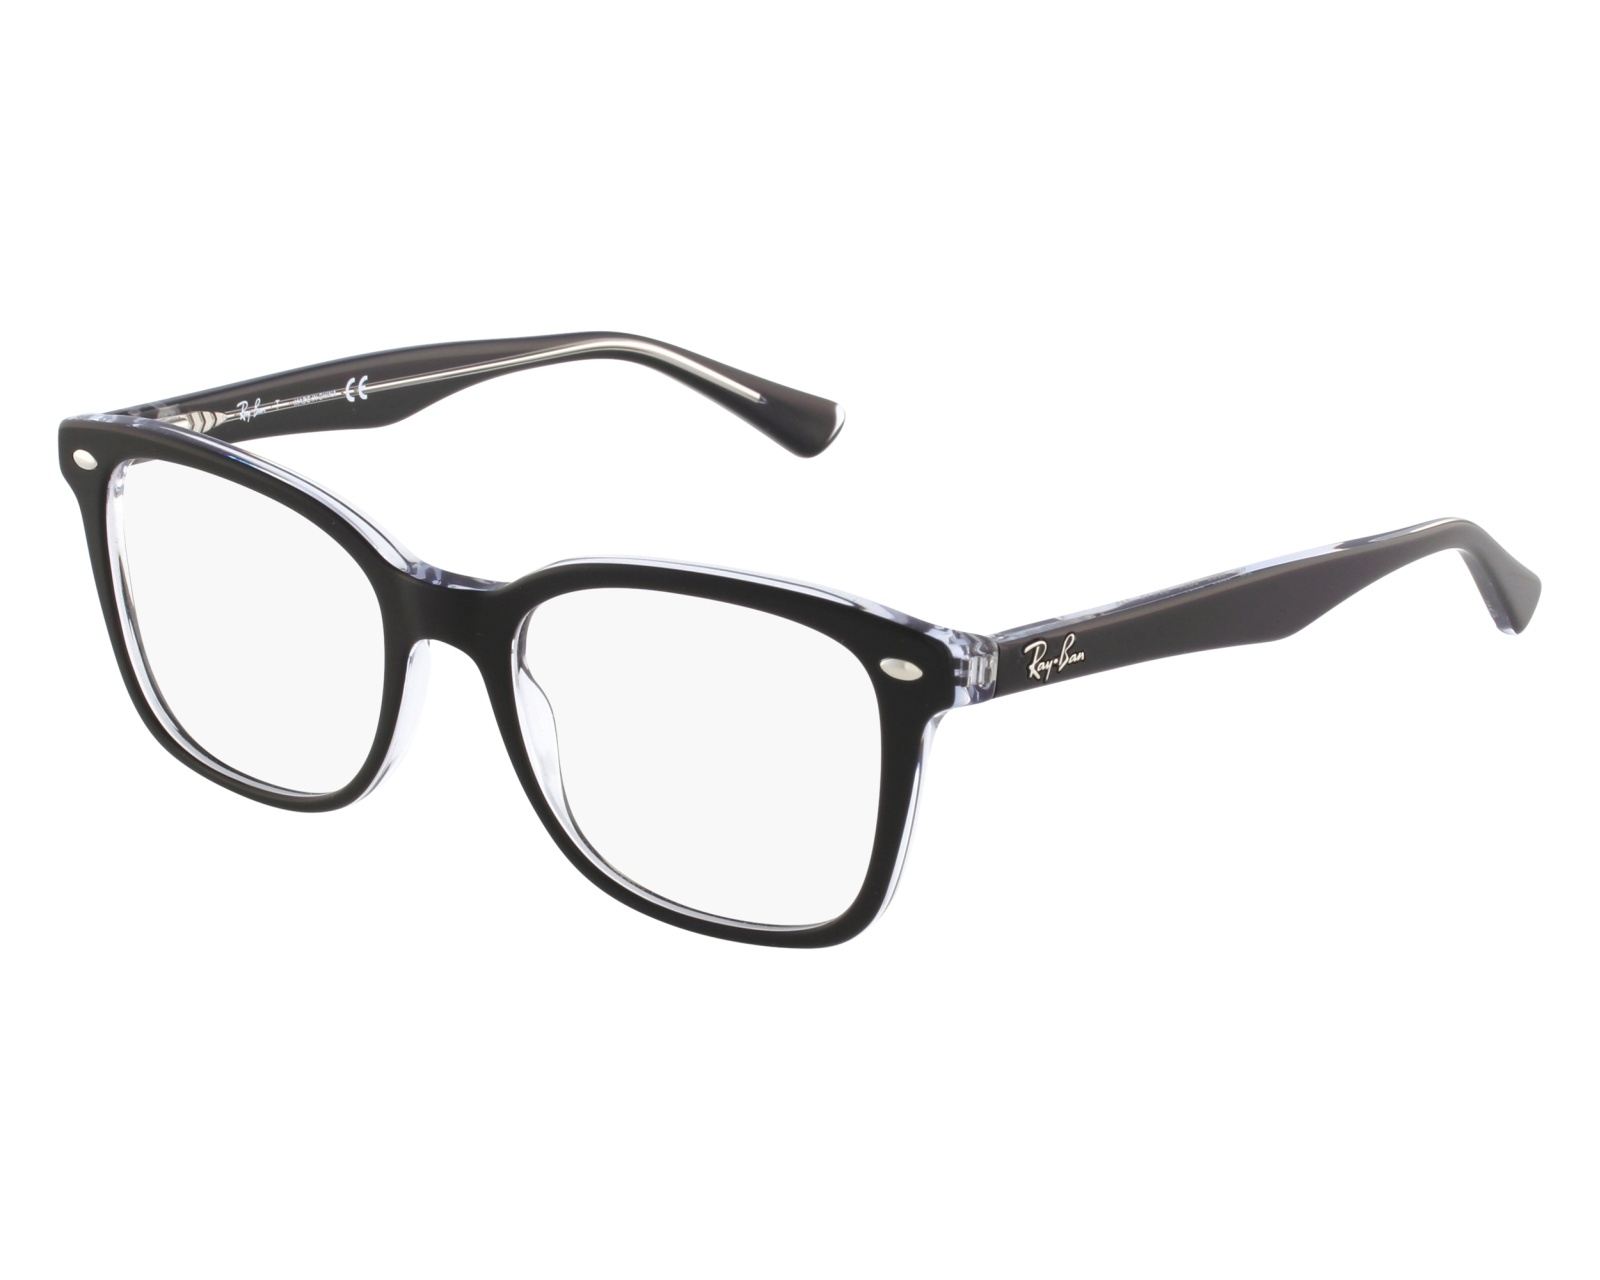 1bdac48a038 eyeglasses Ray-Ban RX-5285 2034 - Black front view